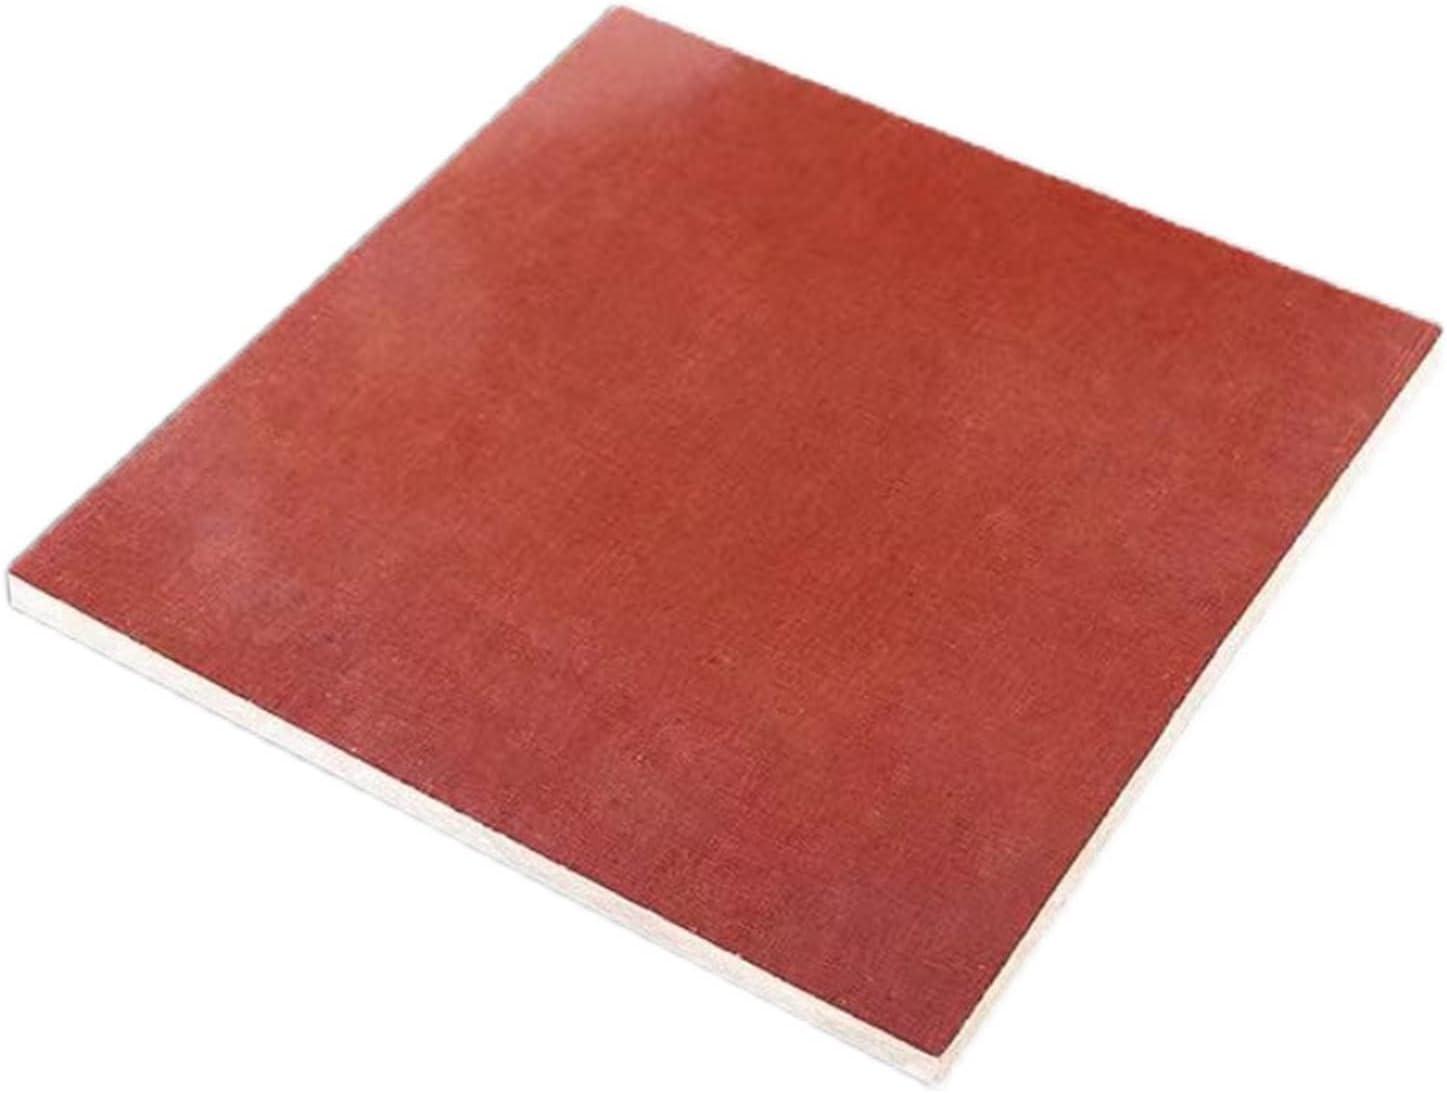 AIMIMI Bakelite Flat Sheet Limited price Phenolic Resin Excellent Panels Omaha Mall Elect